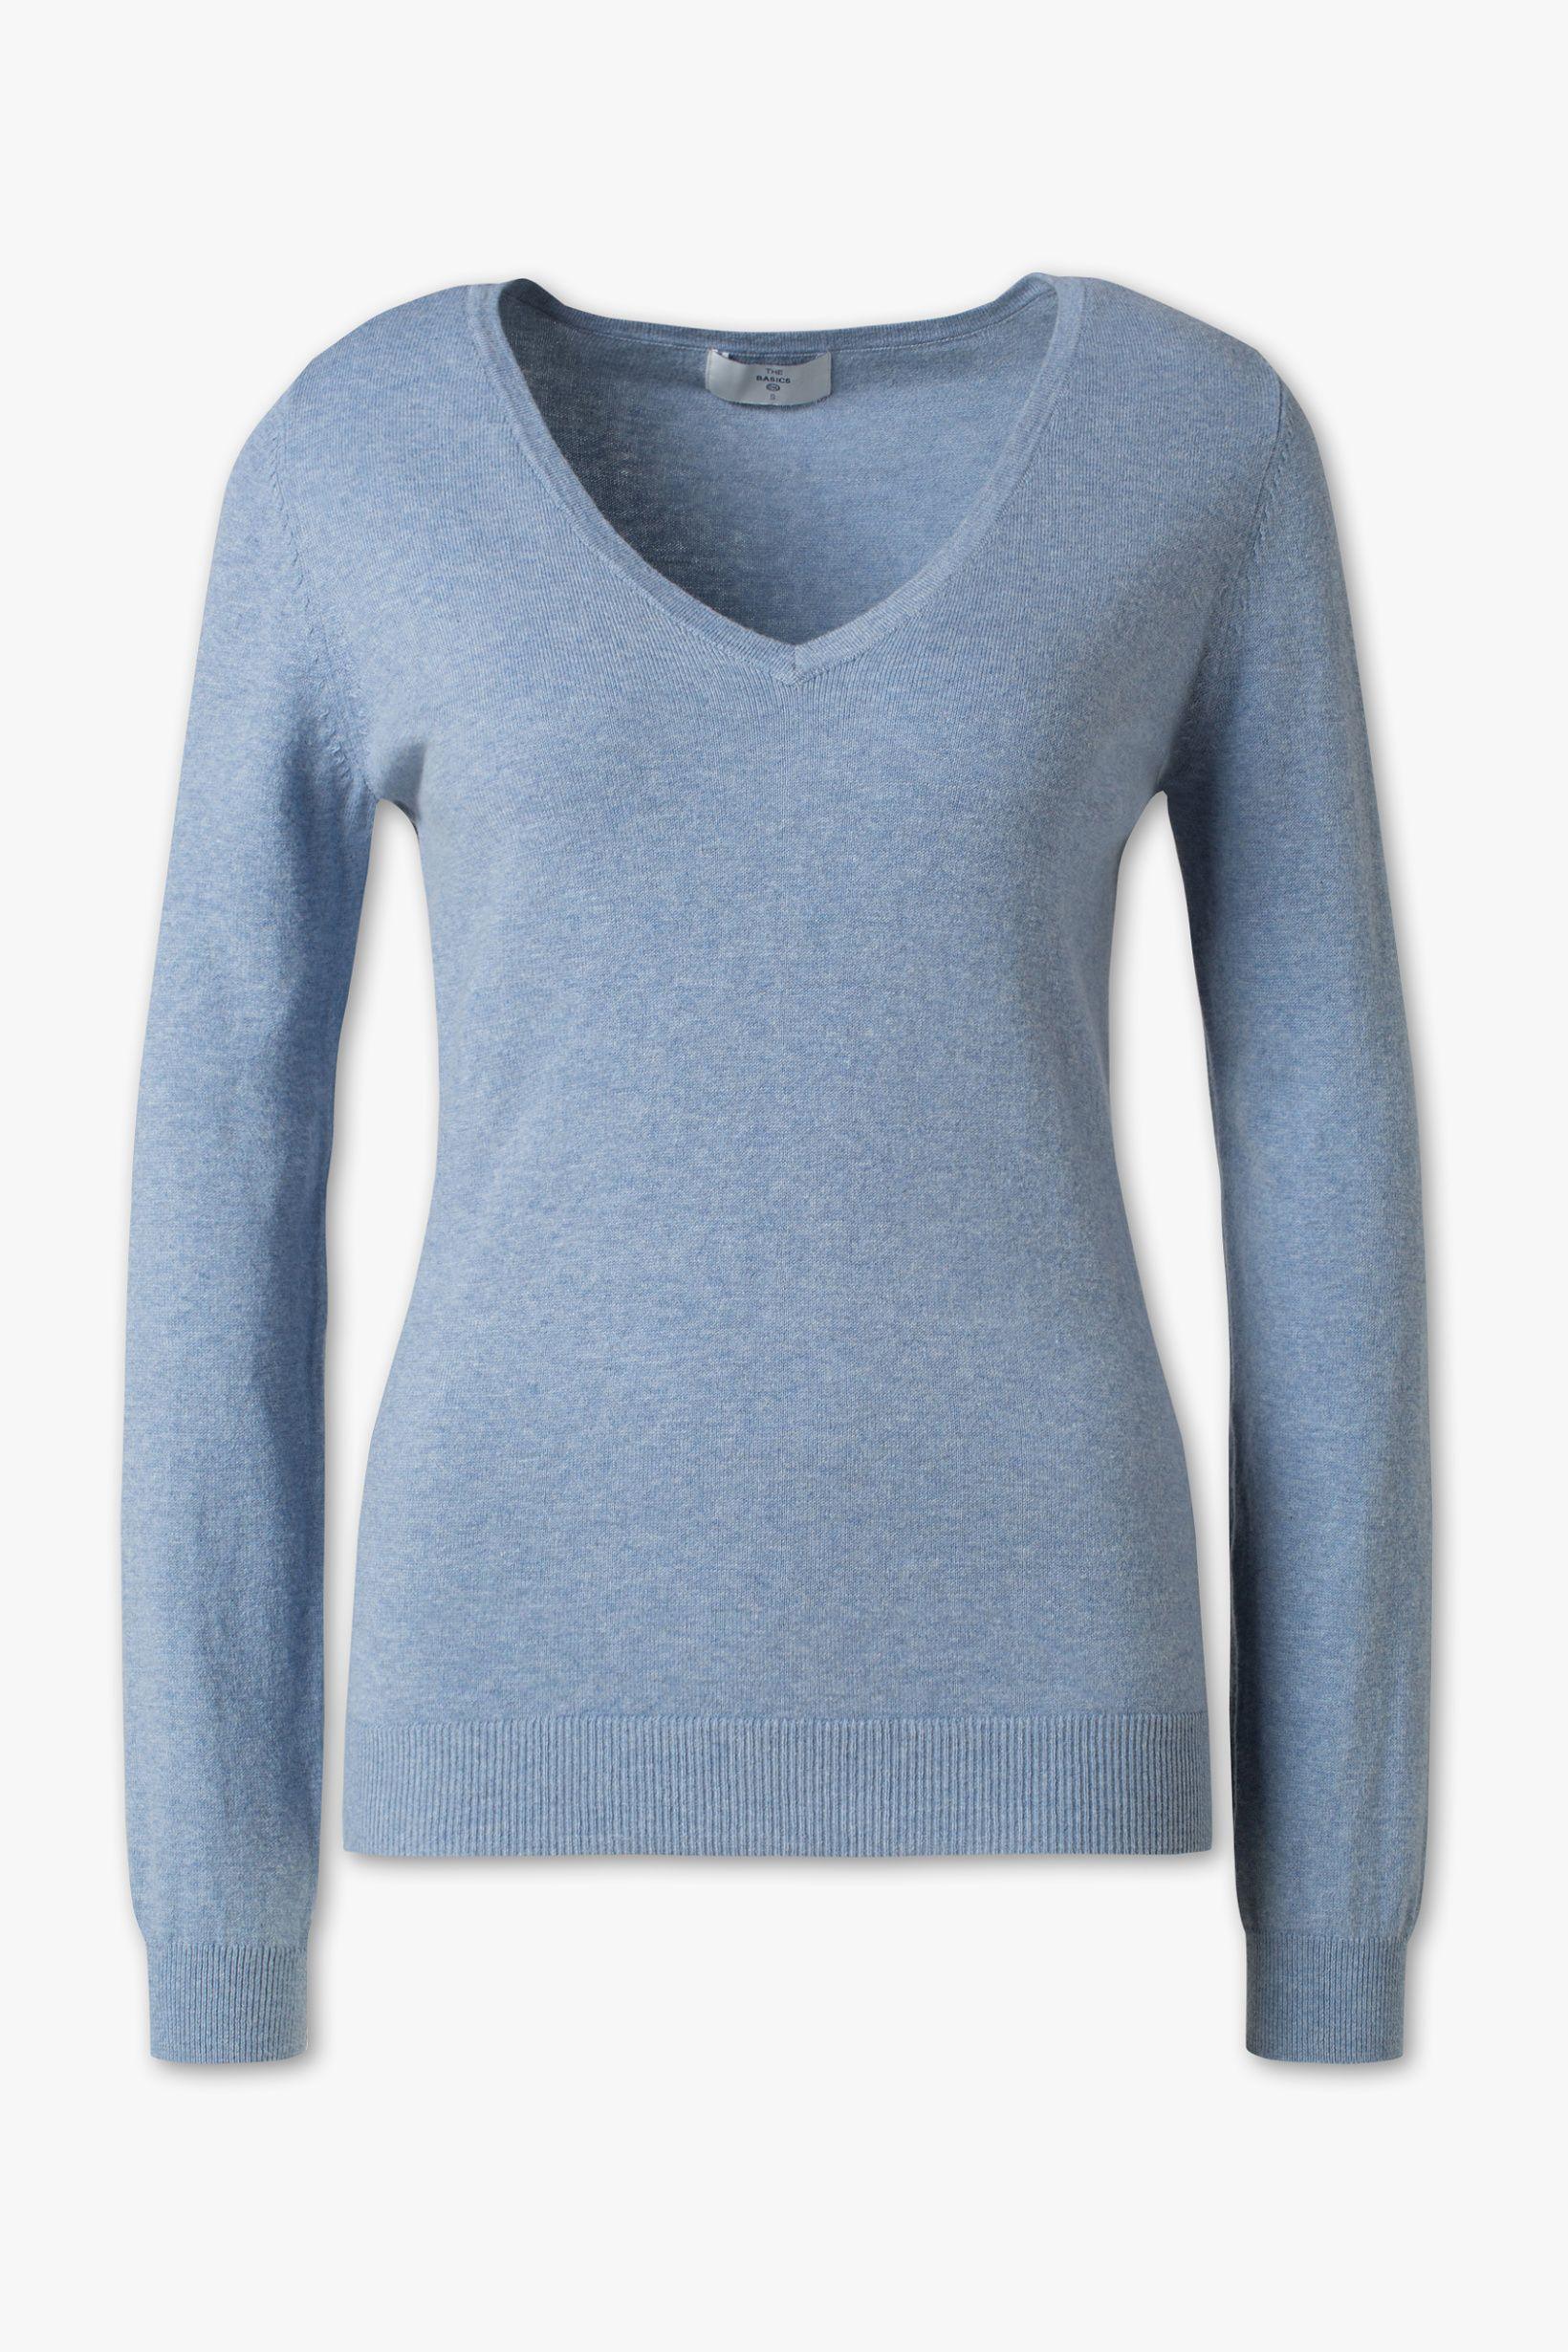 Basic Trui.Yessica Basic Trui Shopping Sweaters Pullover Shopping